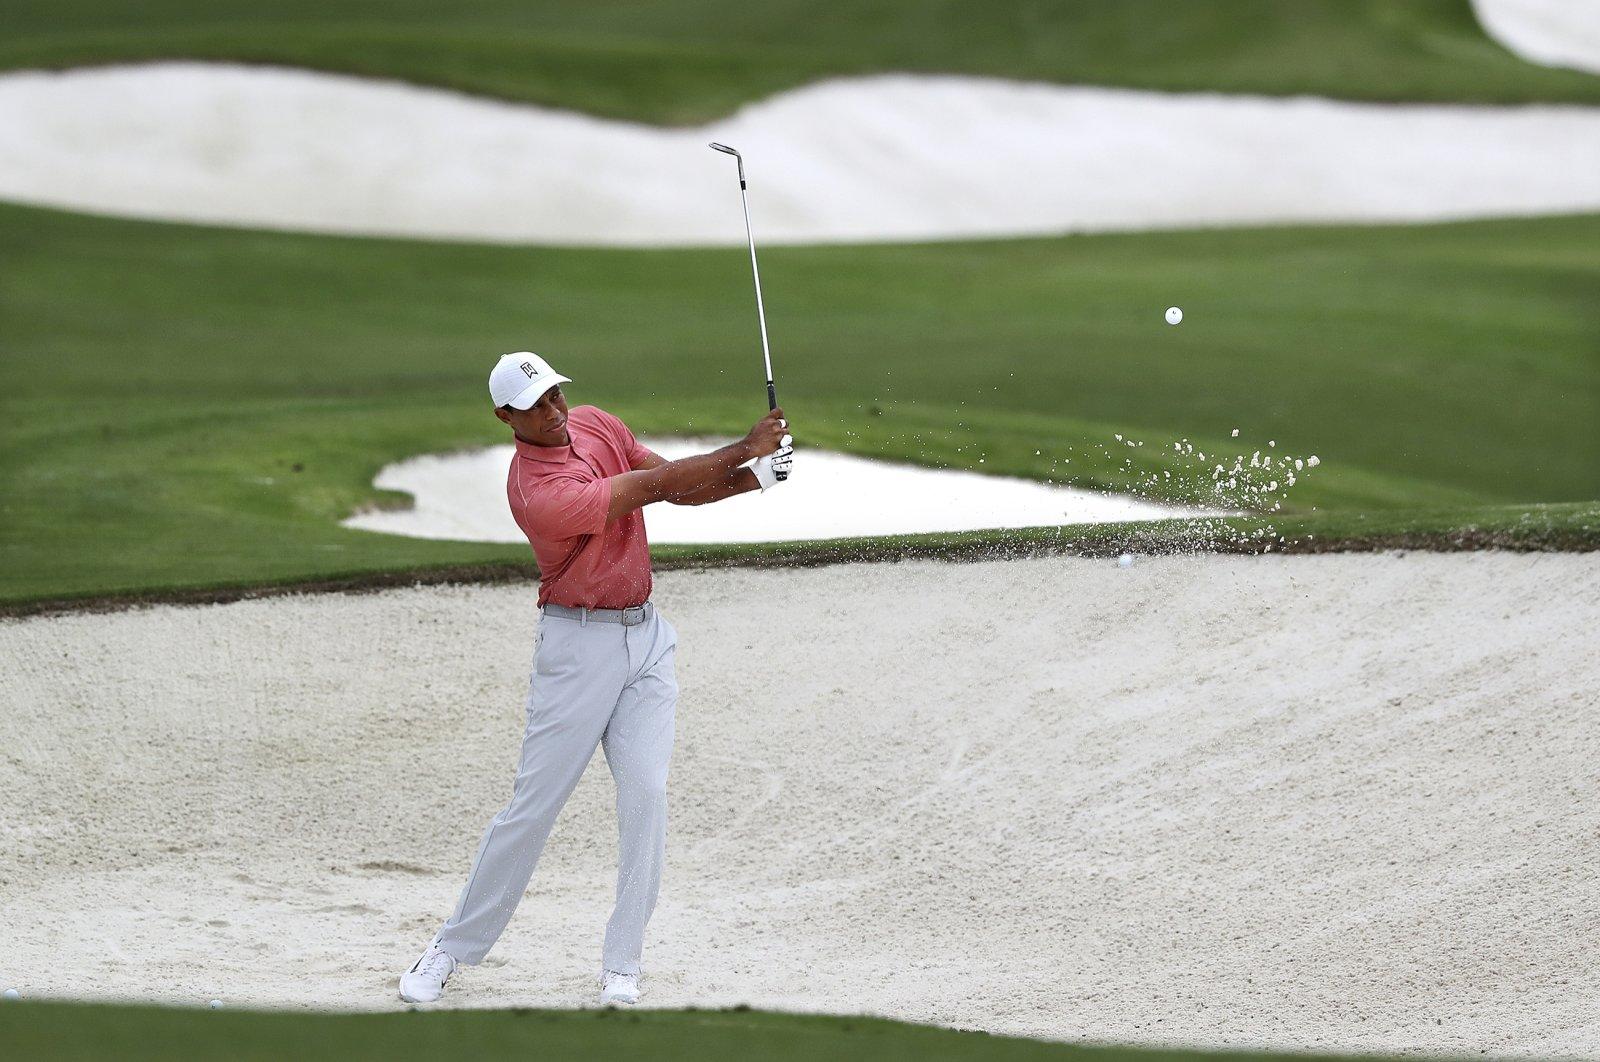 Tiger Woods practices on his sand shots, in Augusta, Georgia, U.S., Nov. 10, 2020. (AP Photo)